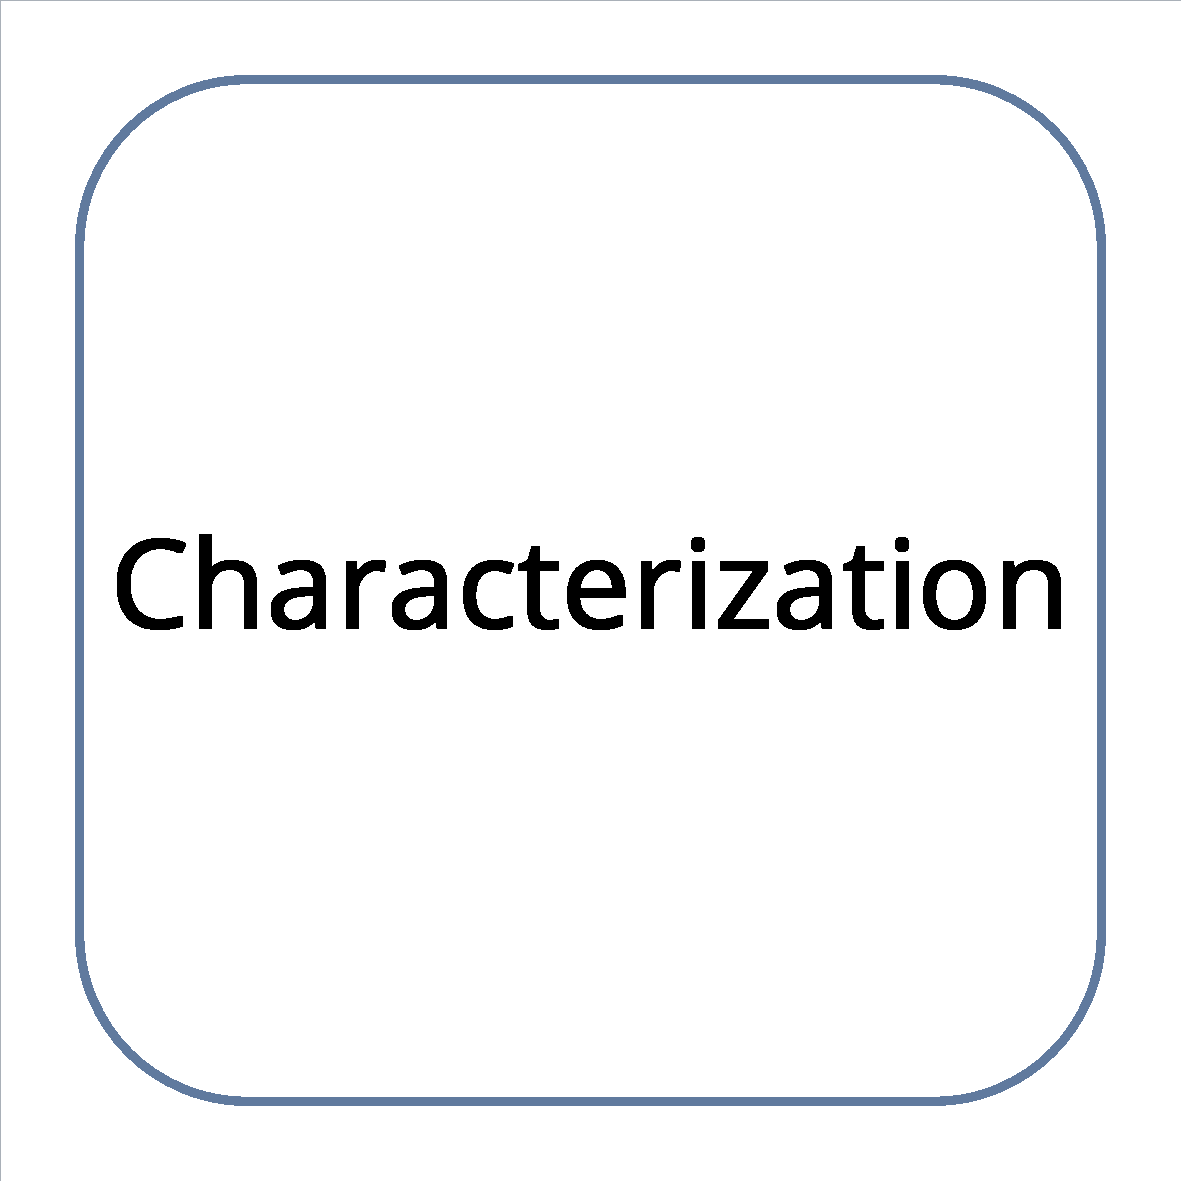 Characterization.png